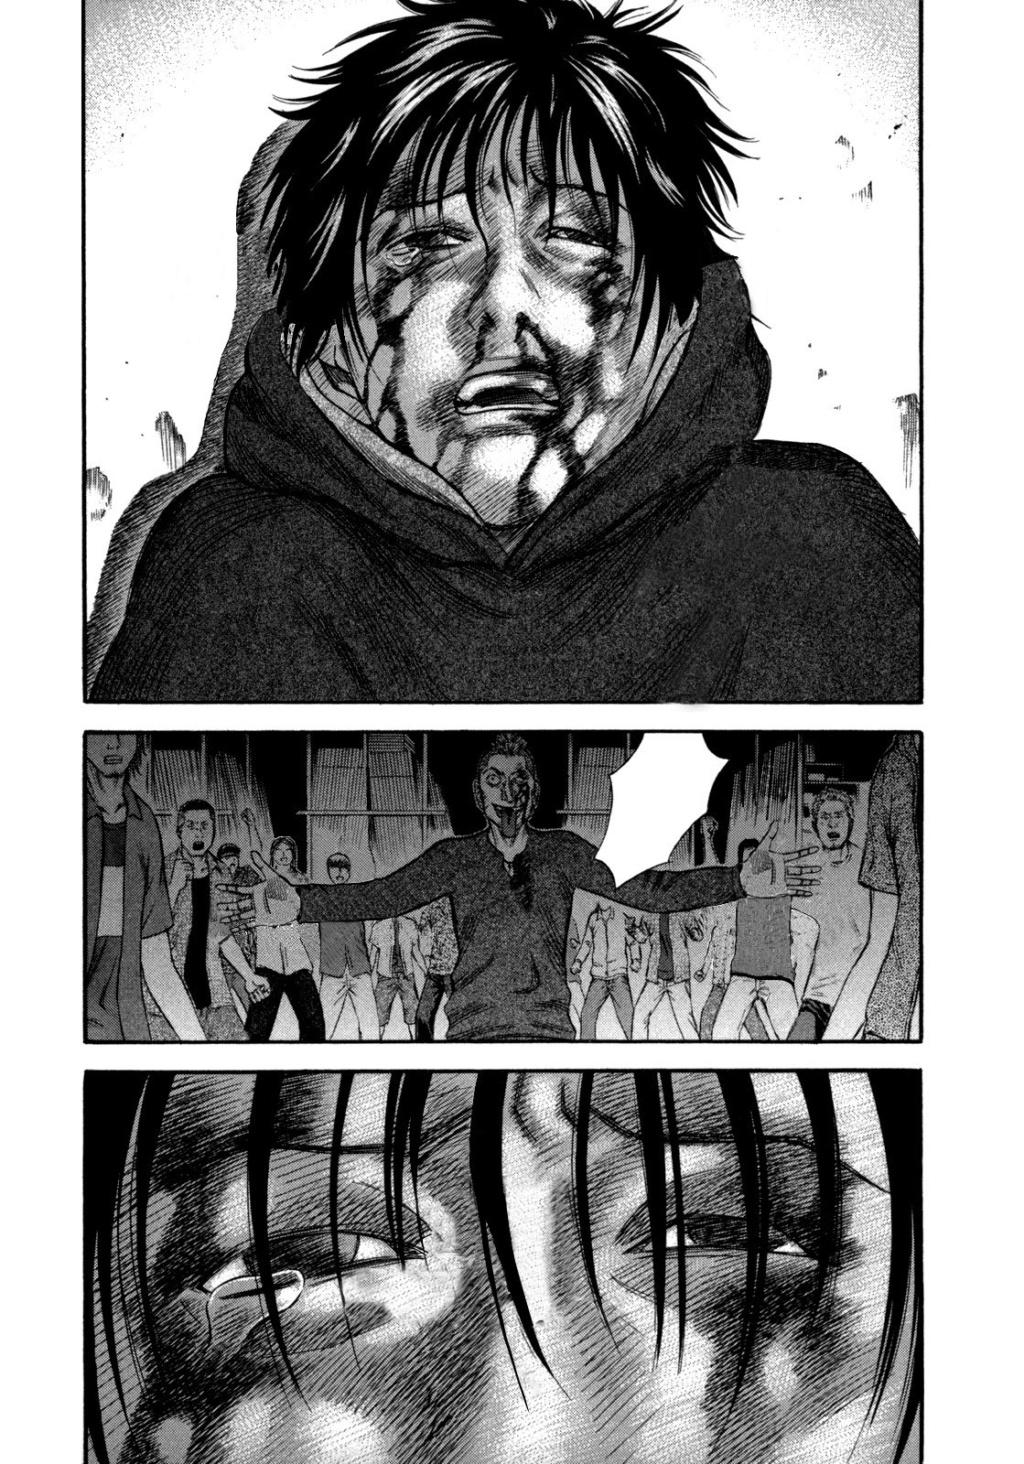 × Dark Storm × .. حيـن تعـصـف ريـآح الـإبدآع !   فريق ترجمة المانجا - صفحة 17 C_user10